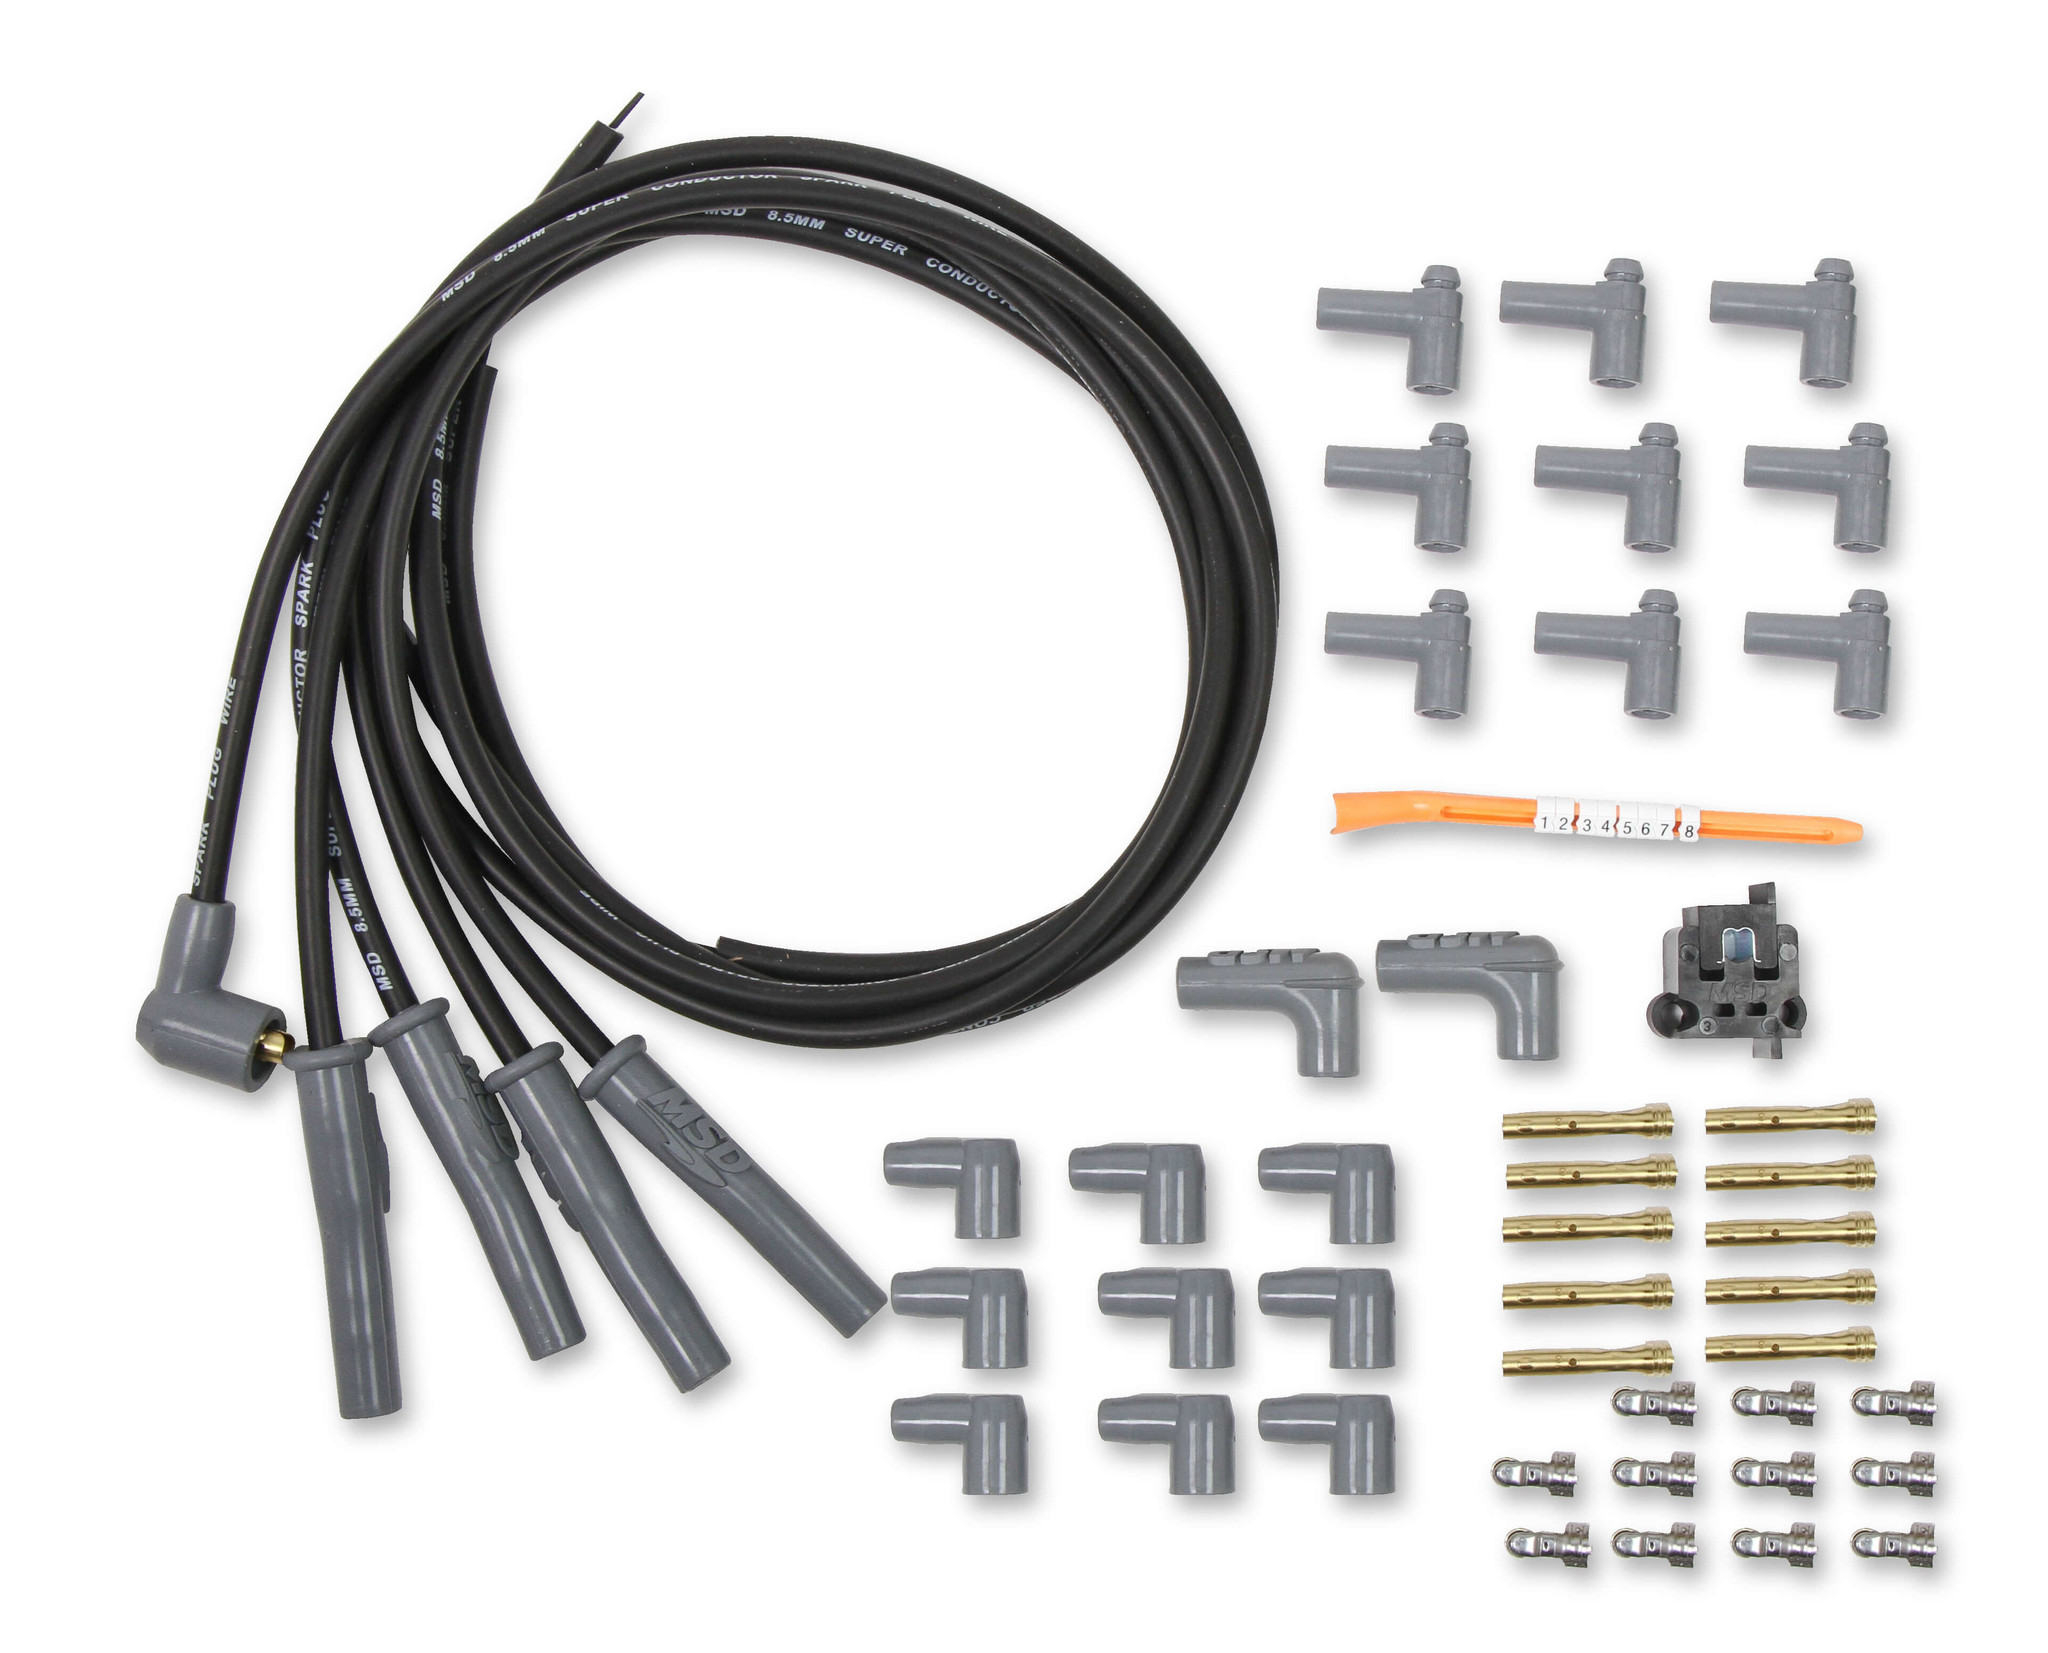 Msd Ignition Spark Plug Wires